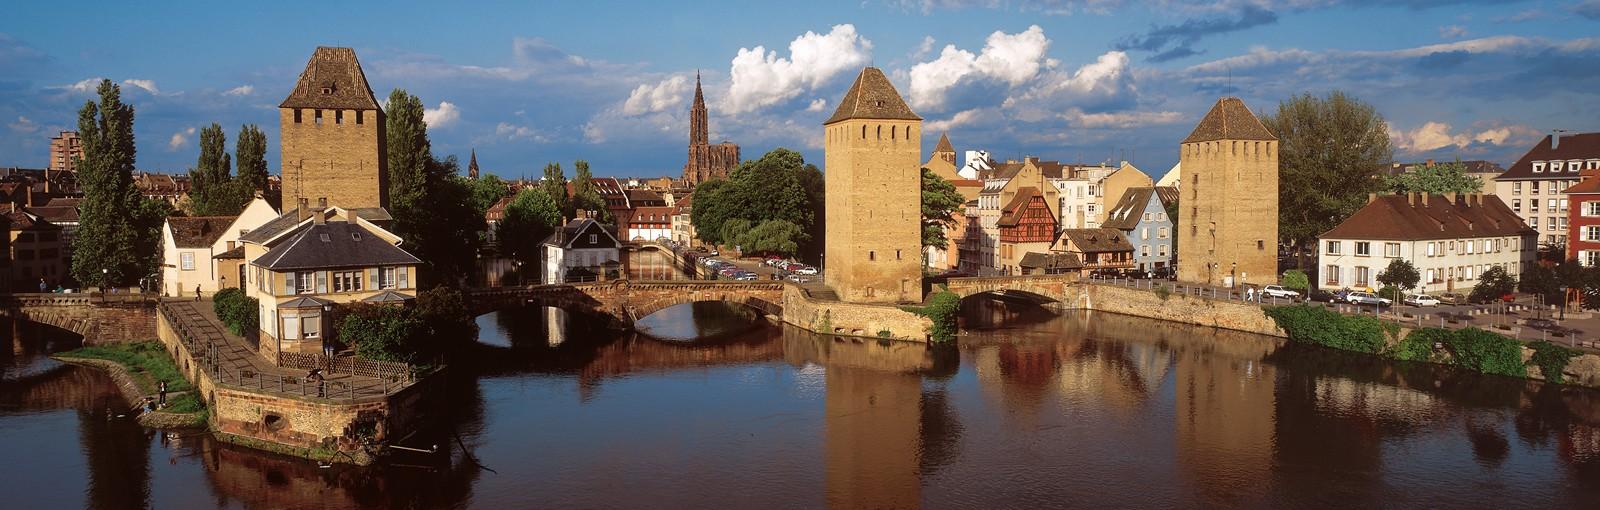 Tours Overnight tour in Alsace - ALSACE - TOURS REGIONALES